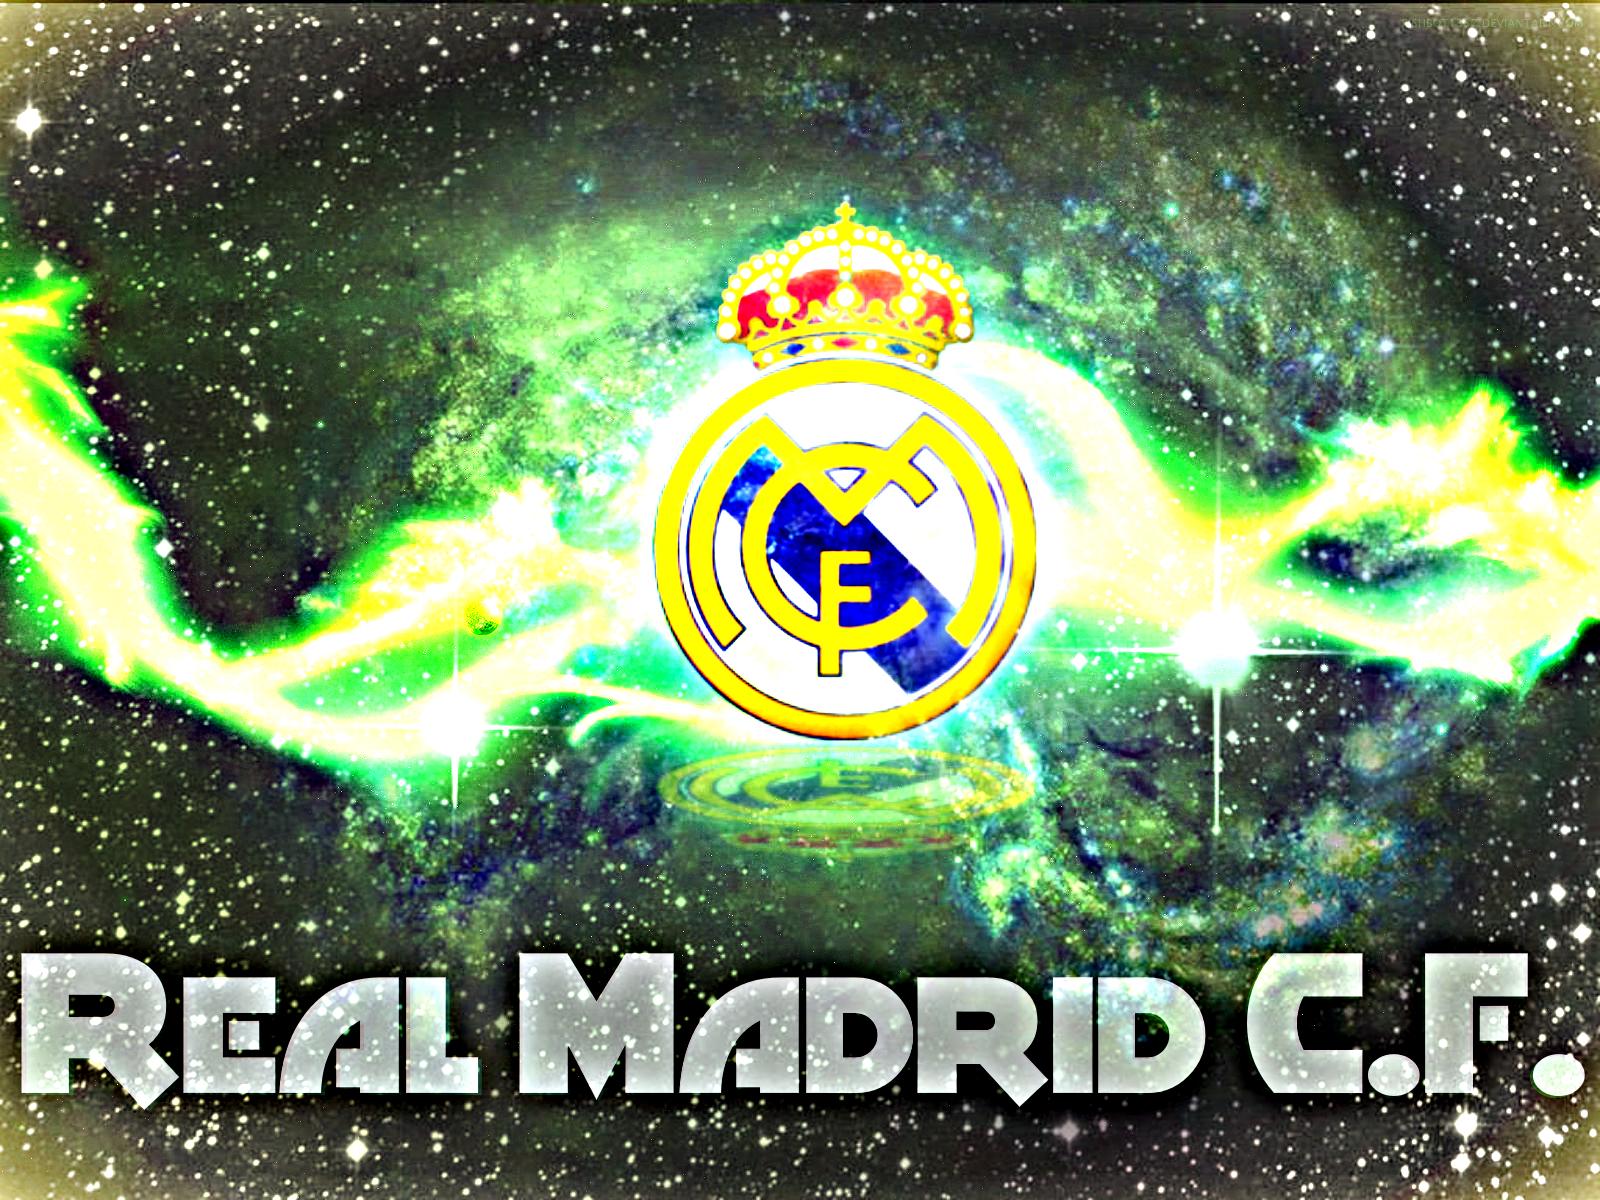 Must see Wallpaper Logo Real Madrid - real_madrid_logo_wallpaper_by_chrisramos4-d7f5i5r  You Should Have_168498.jpg